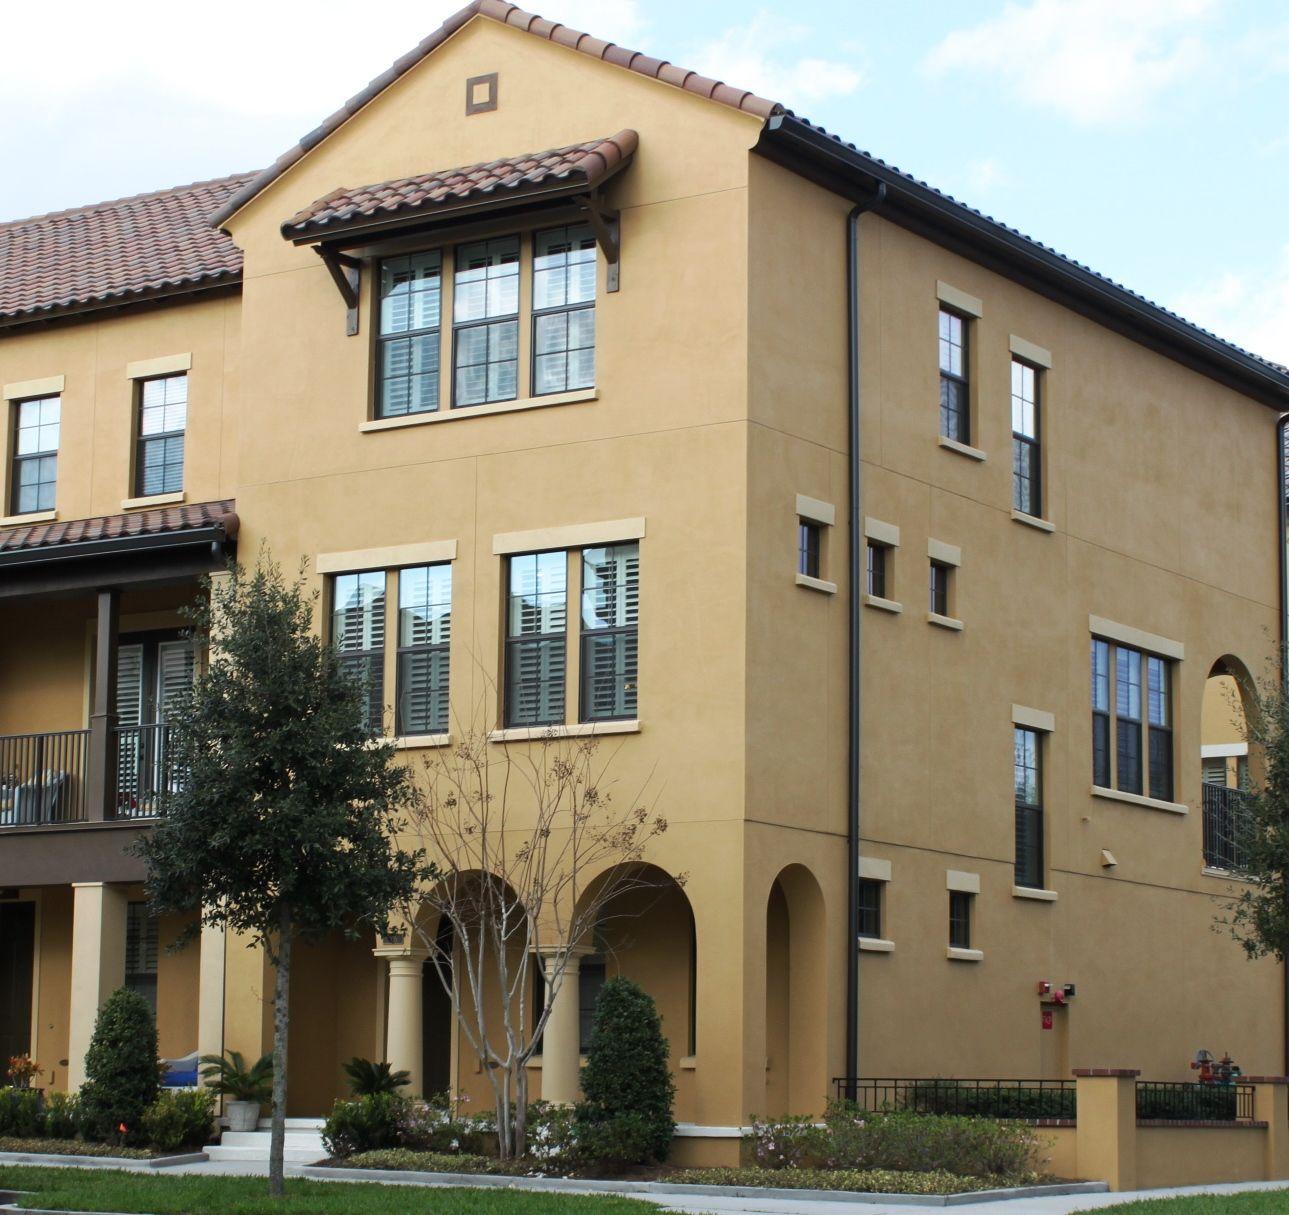 Baldwin Park Orlando: Just Sold This Beautiful Townhome In Baldwin Park, Orlando